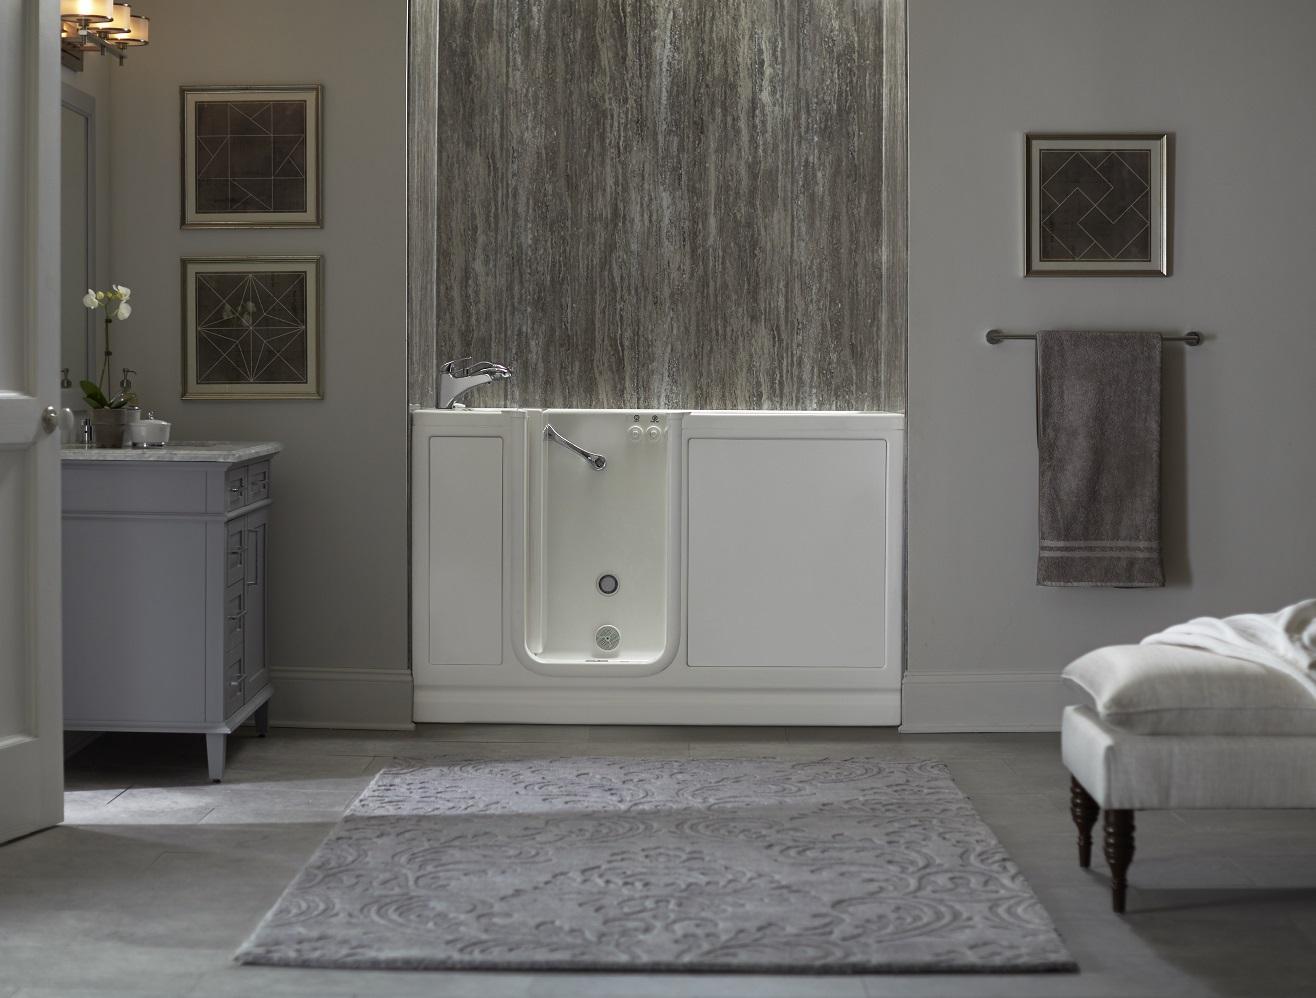 Jacuzzi Tub Clarksville TN - Bathroom remodel clarksville tn